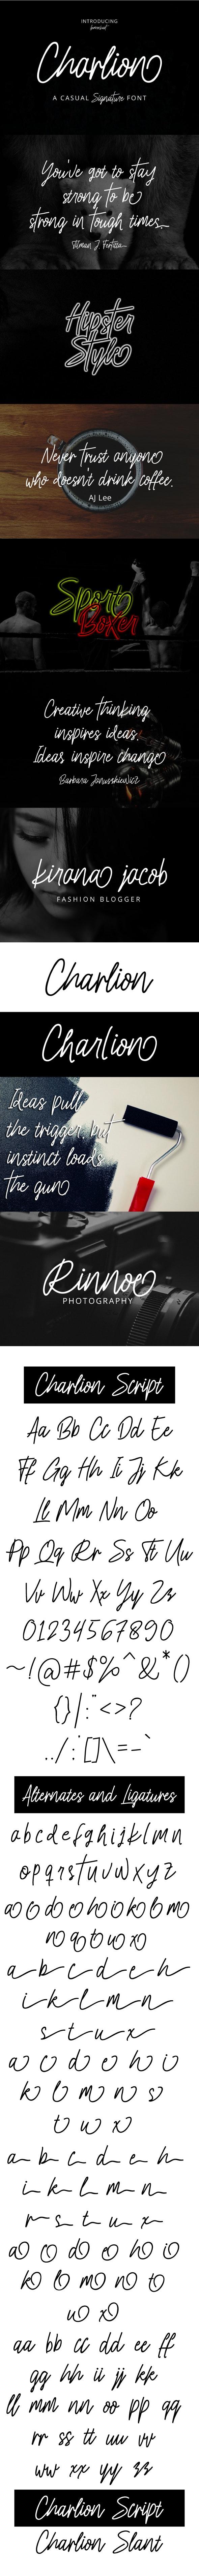 Charlion Script 2 Style - Calligraphy Script